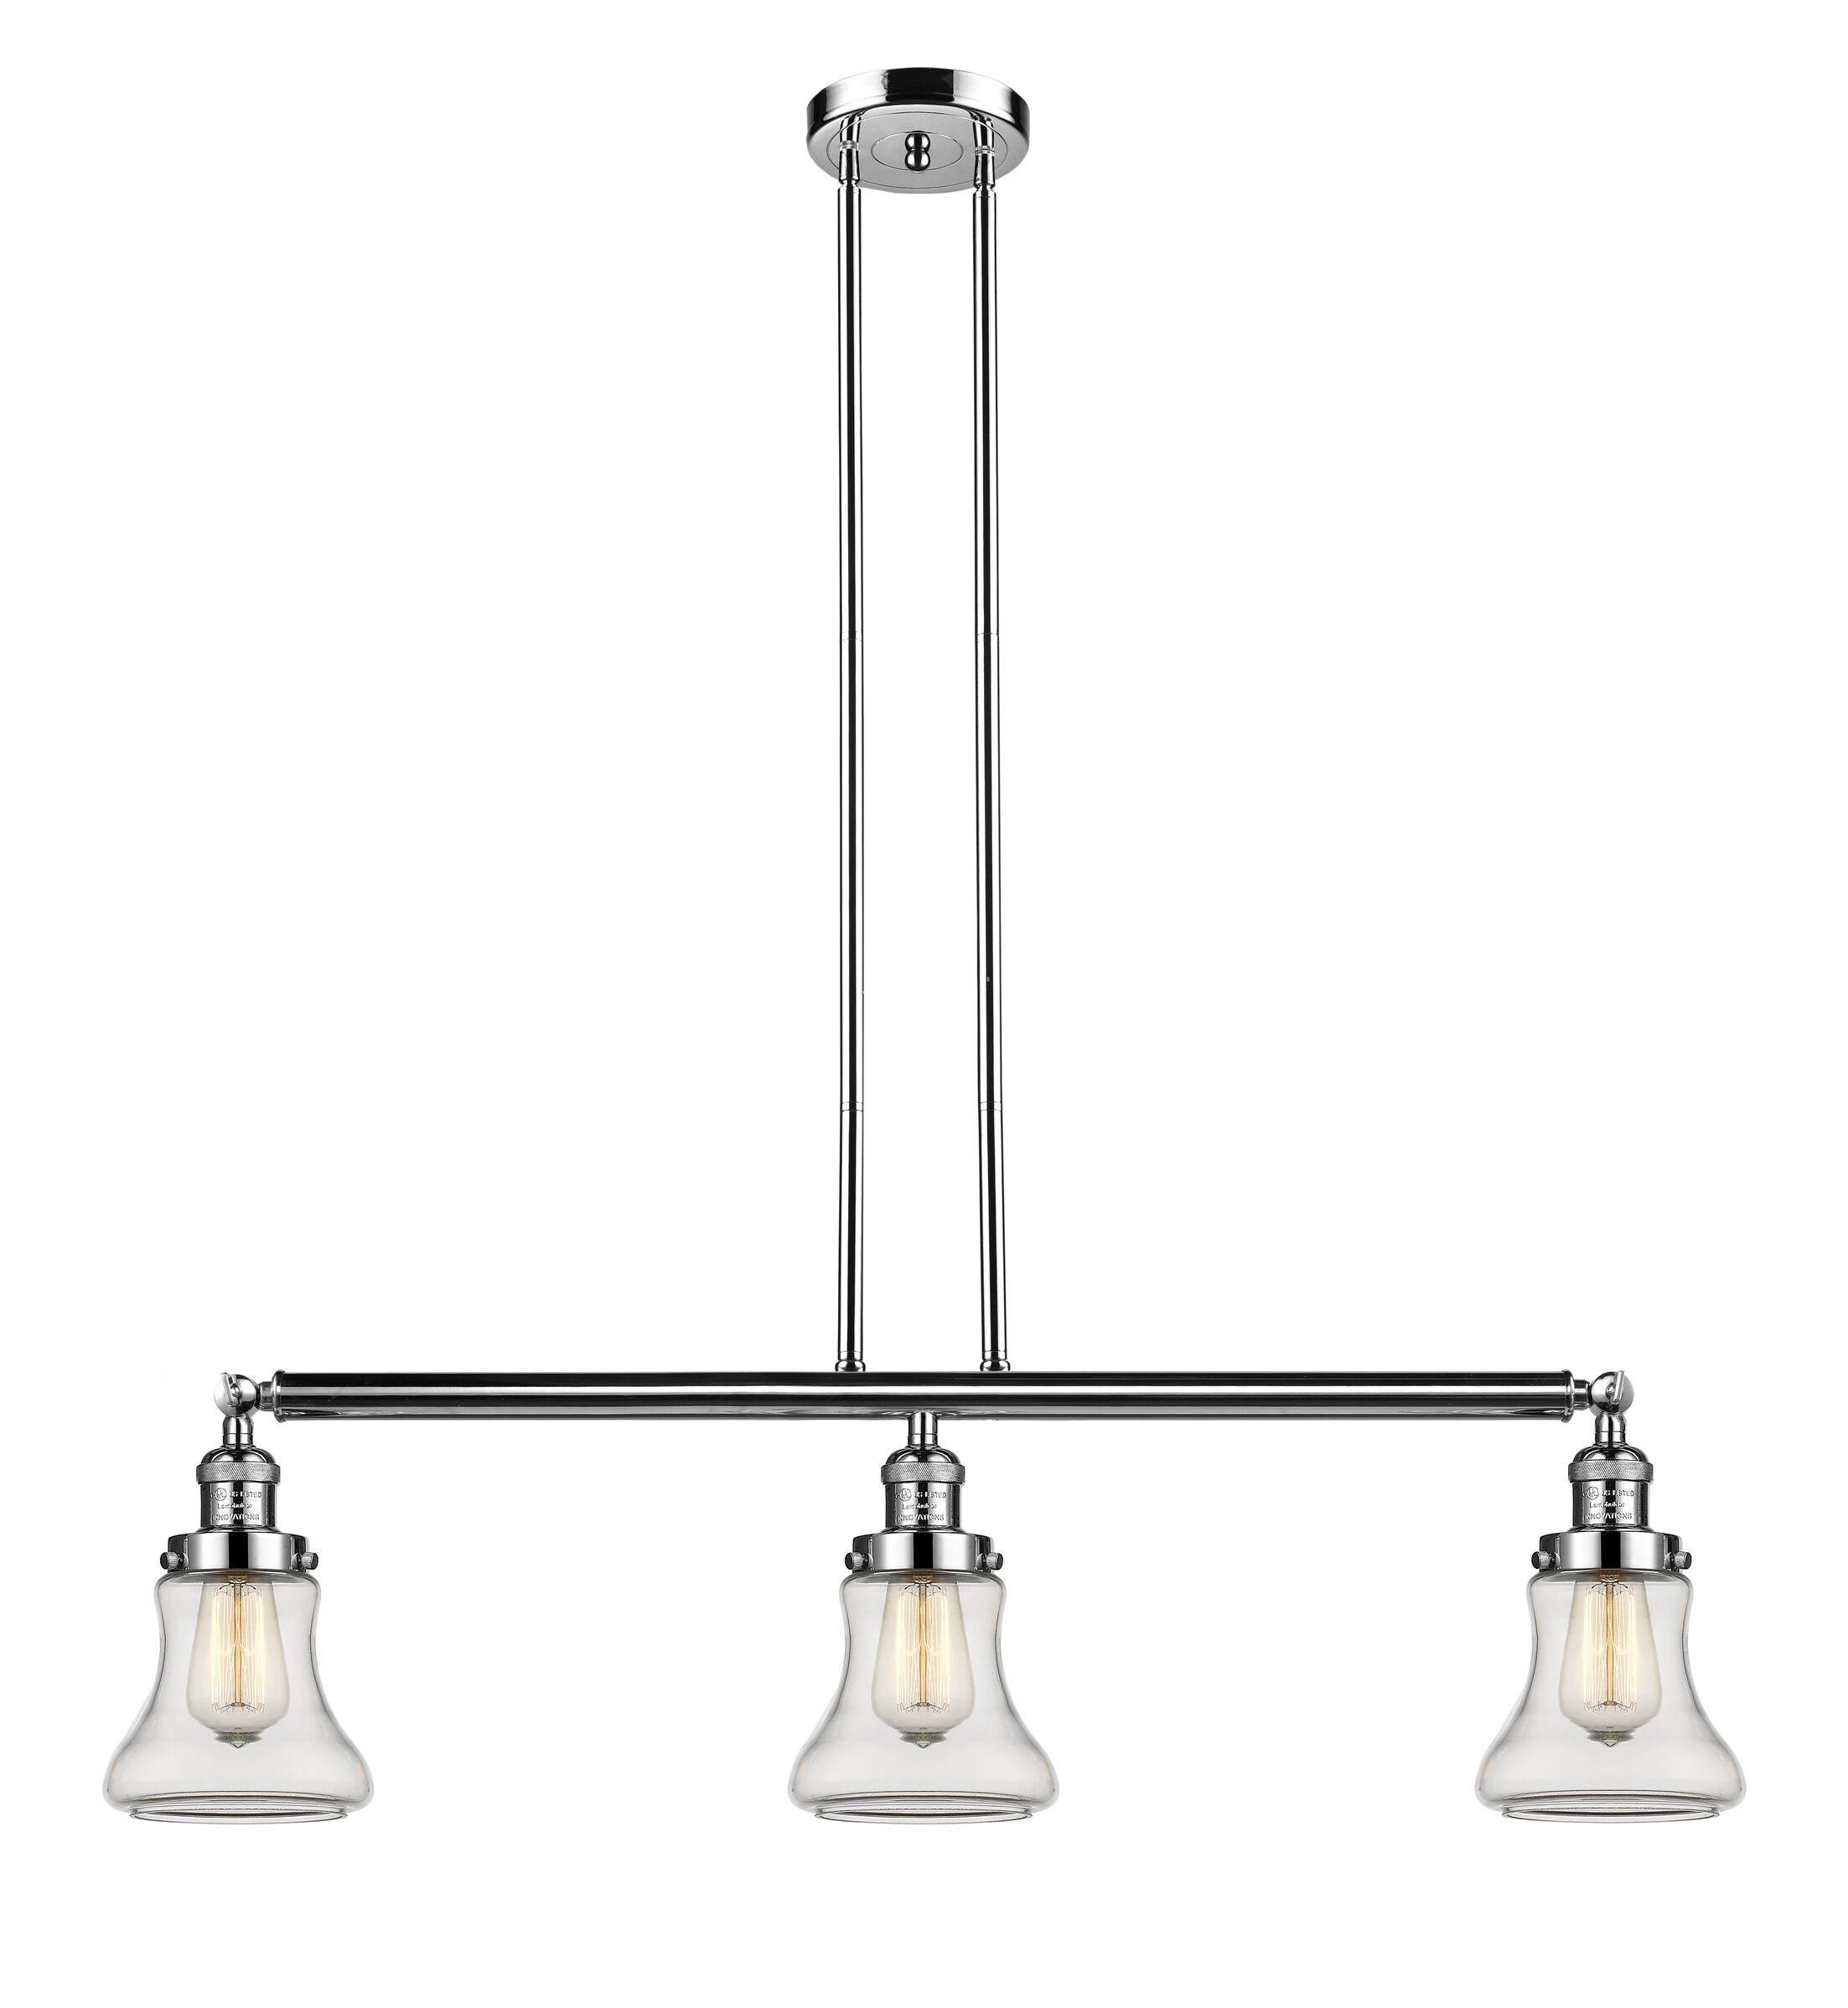 Nardone 3-Light Kitchen Island Pendant Shade Color: Clear, Bulb Type: Incandescent, Finish: Polished Nickel